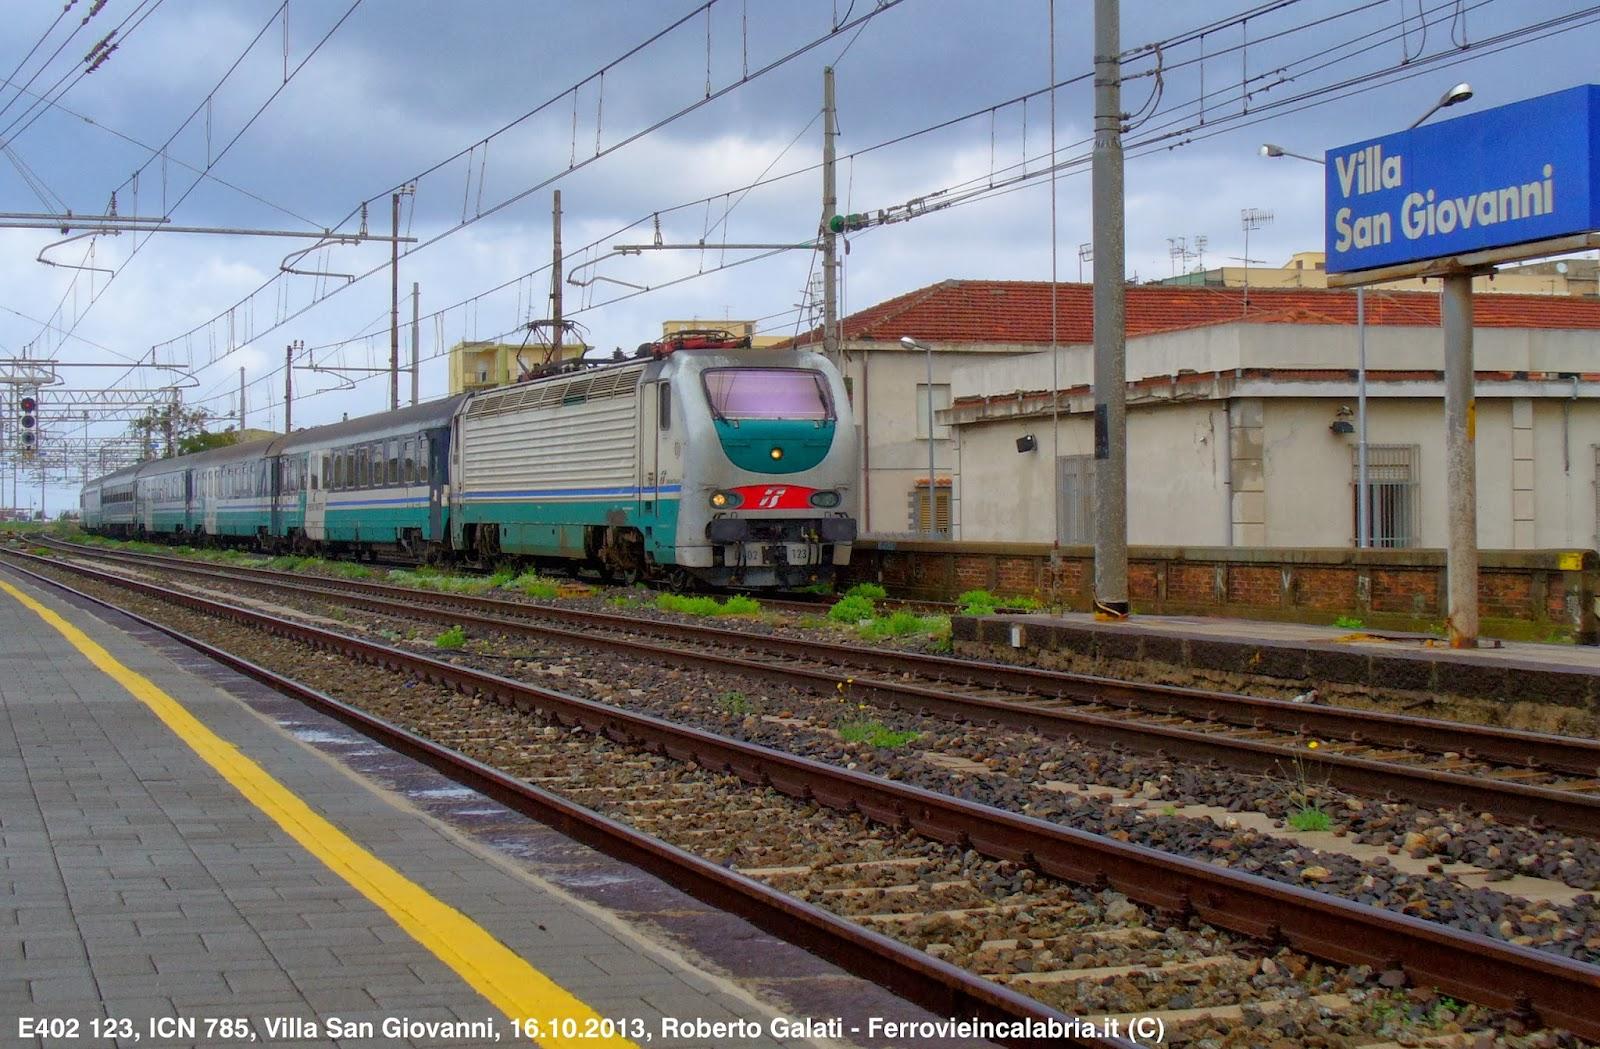 E402 123-ICN785-VillaSanGiovanni-2013-10-16-RobertoGalati